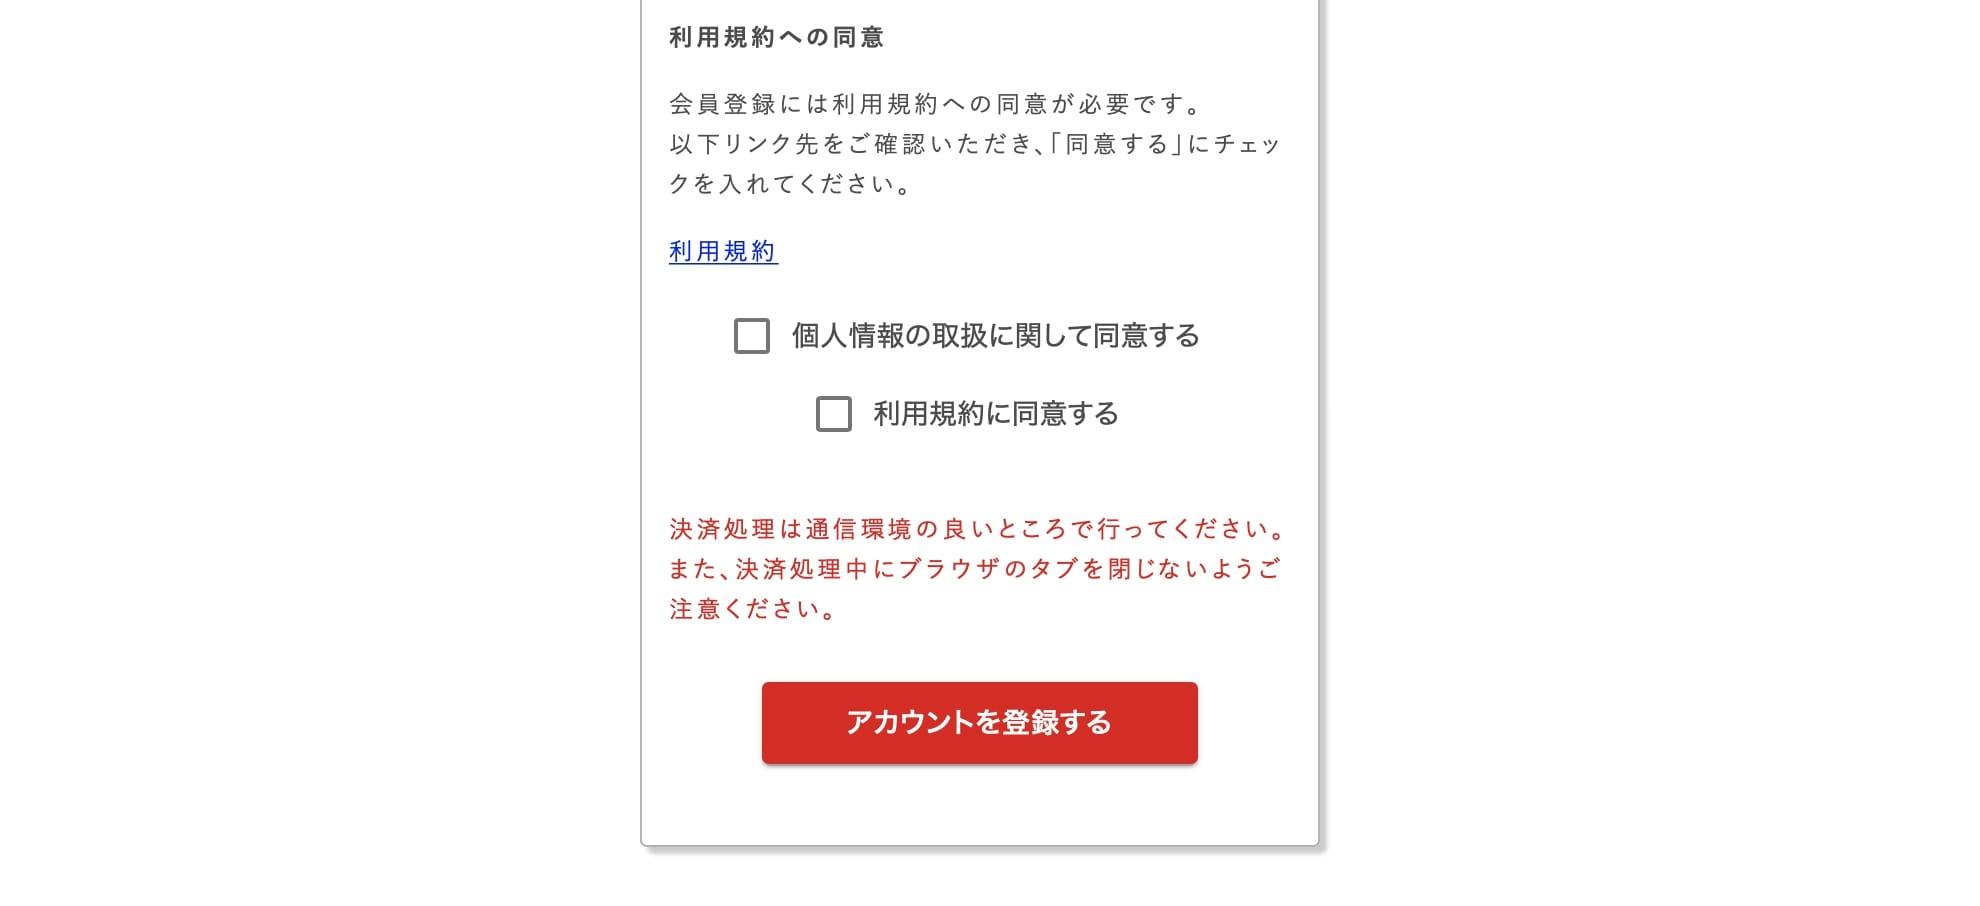 Playgroundの登録フォームNO3